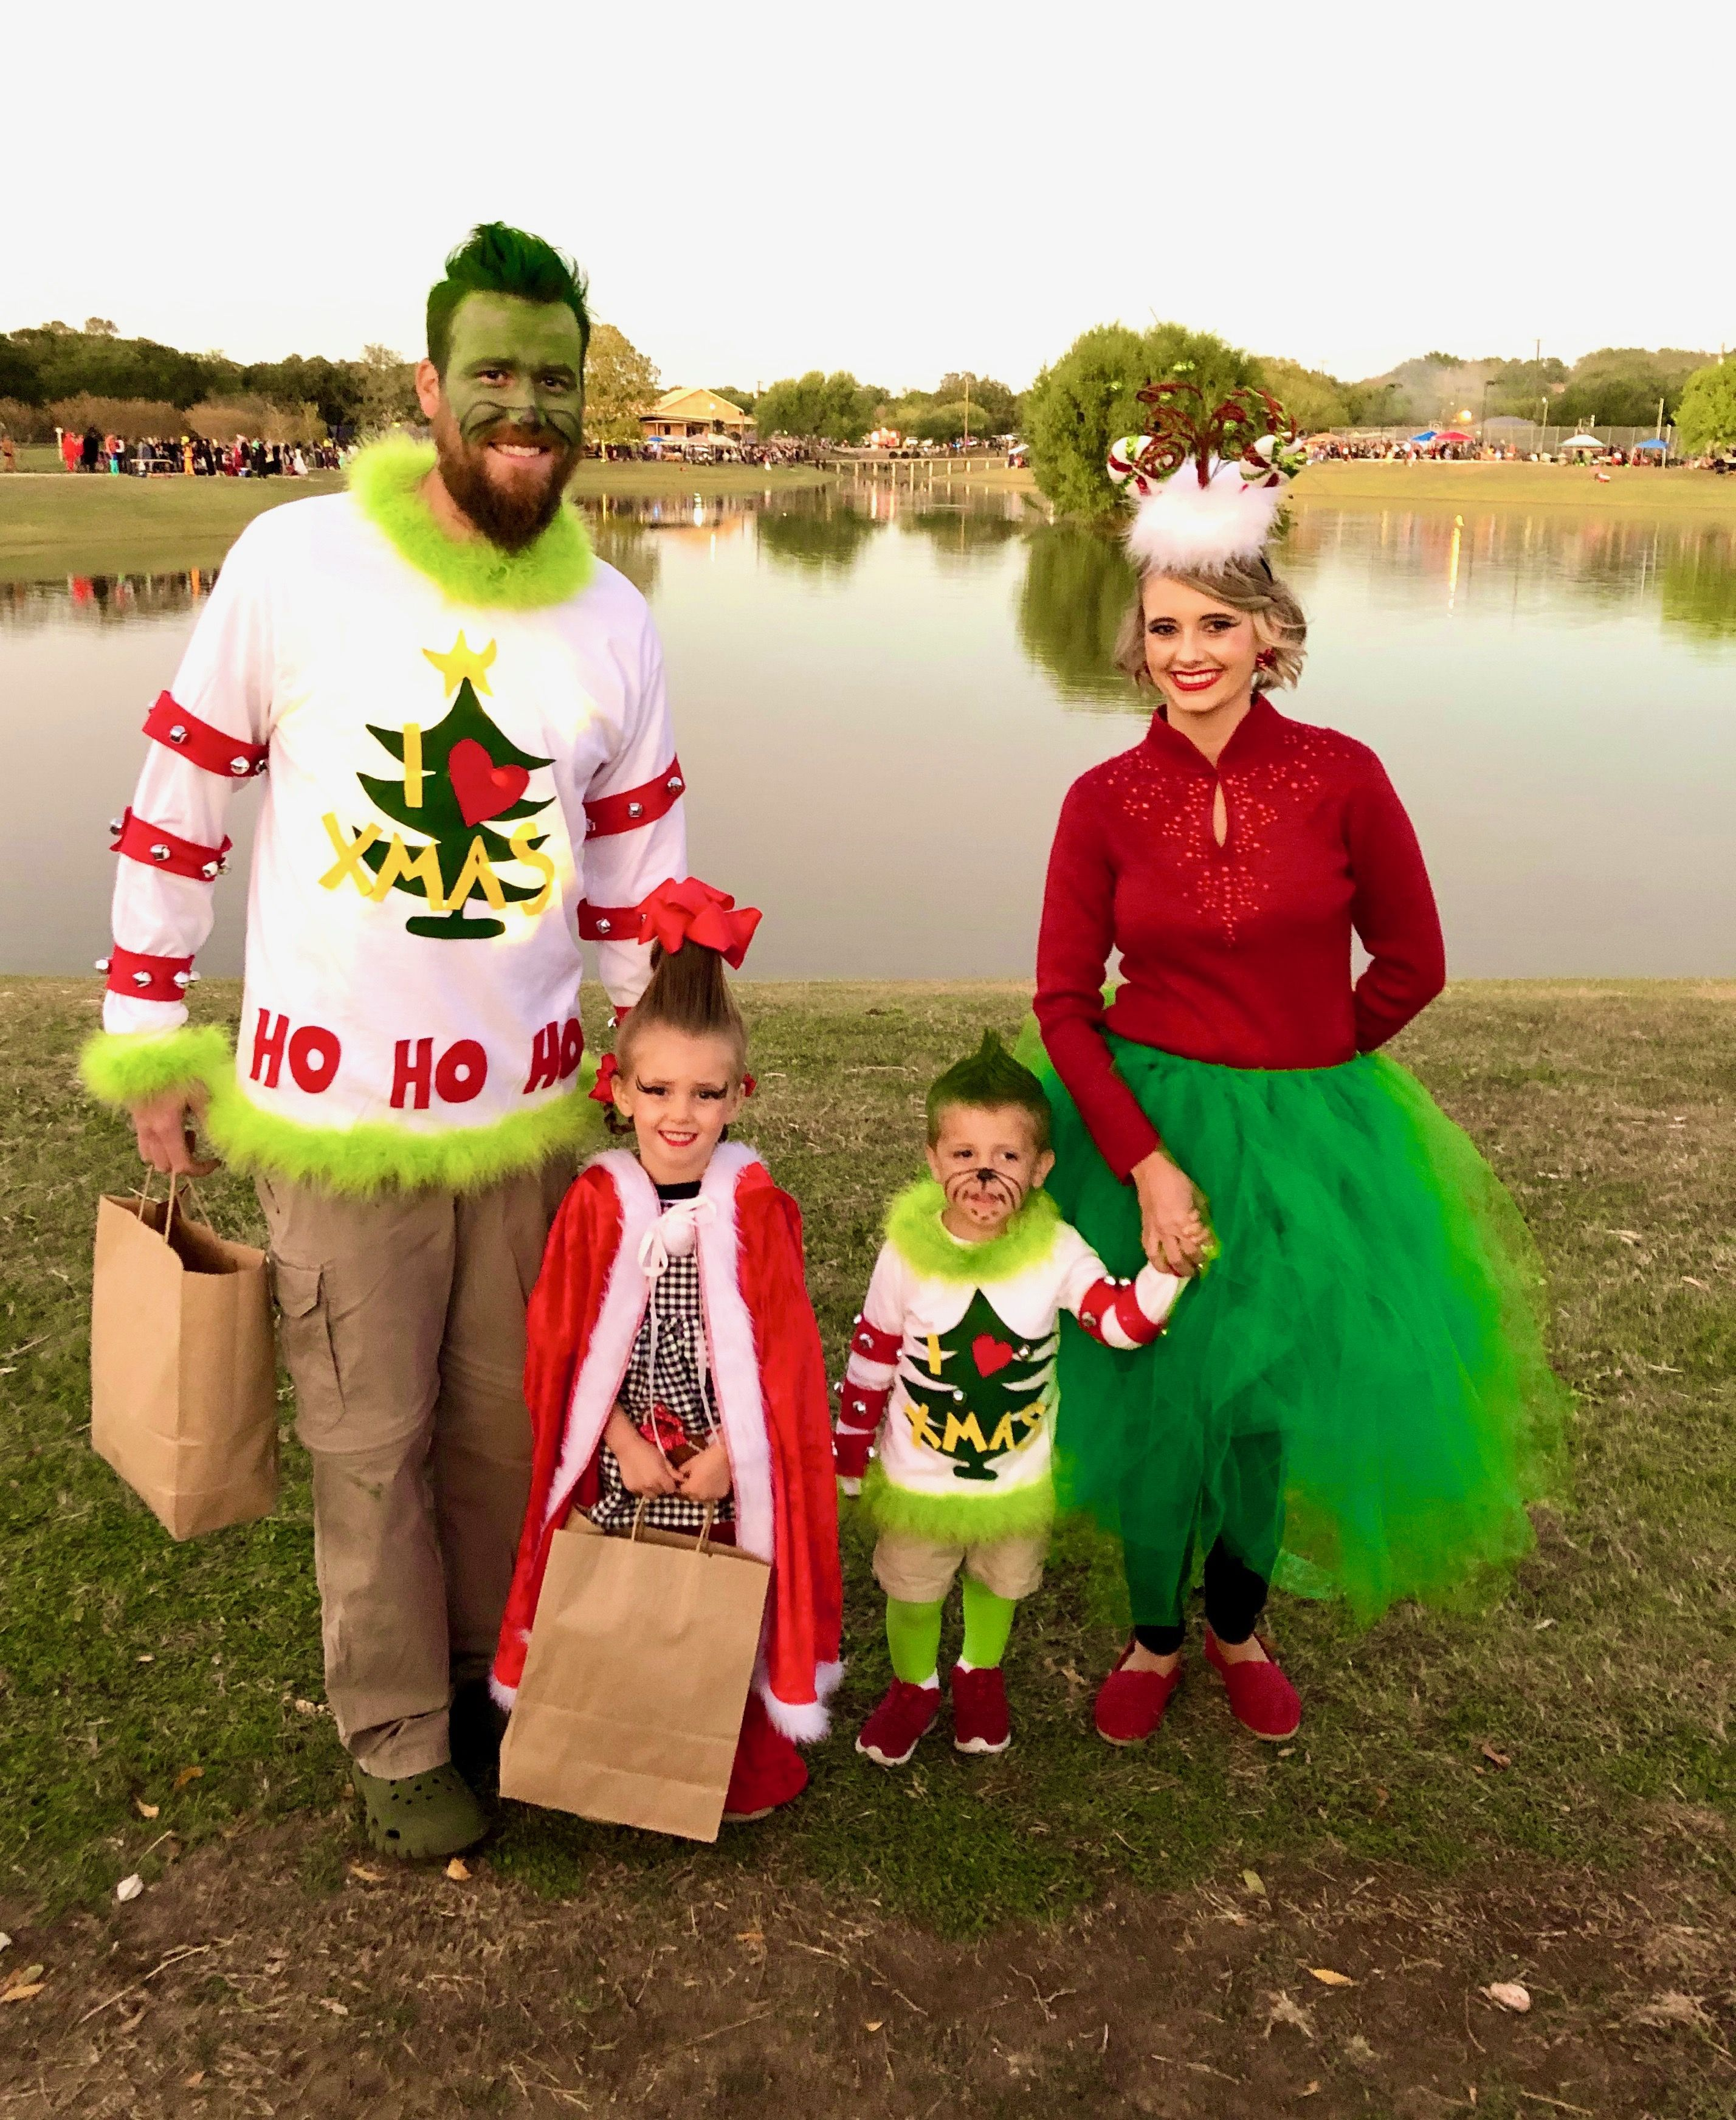 Family Grinch Costume grinch grinchchristmas halloween